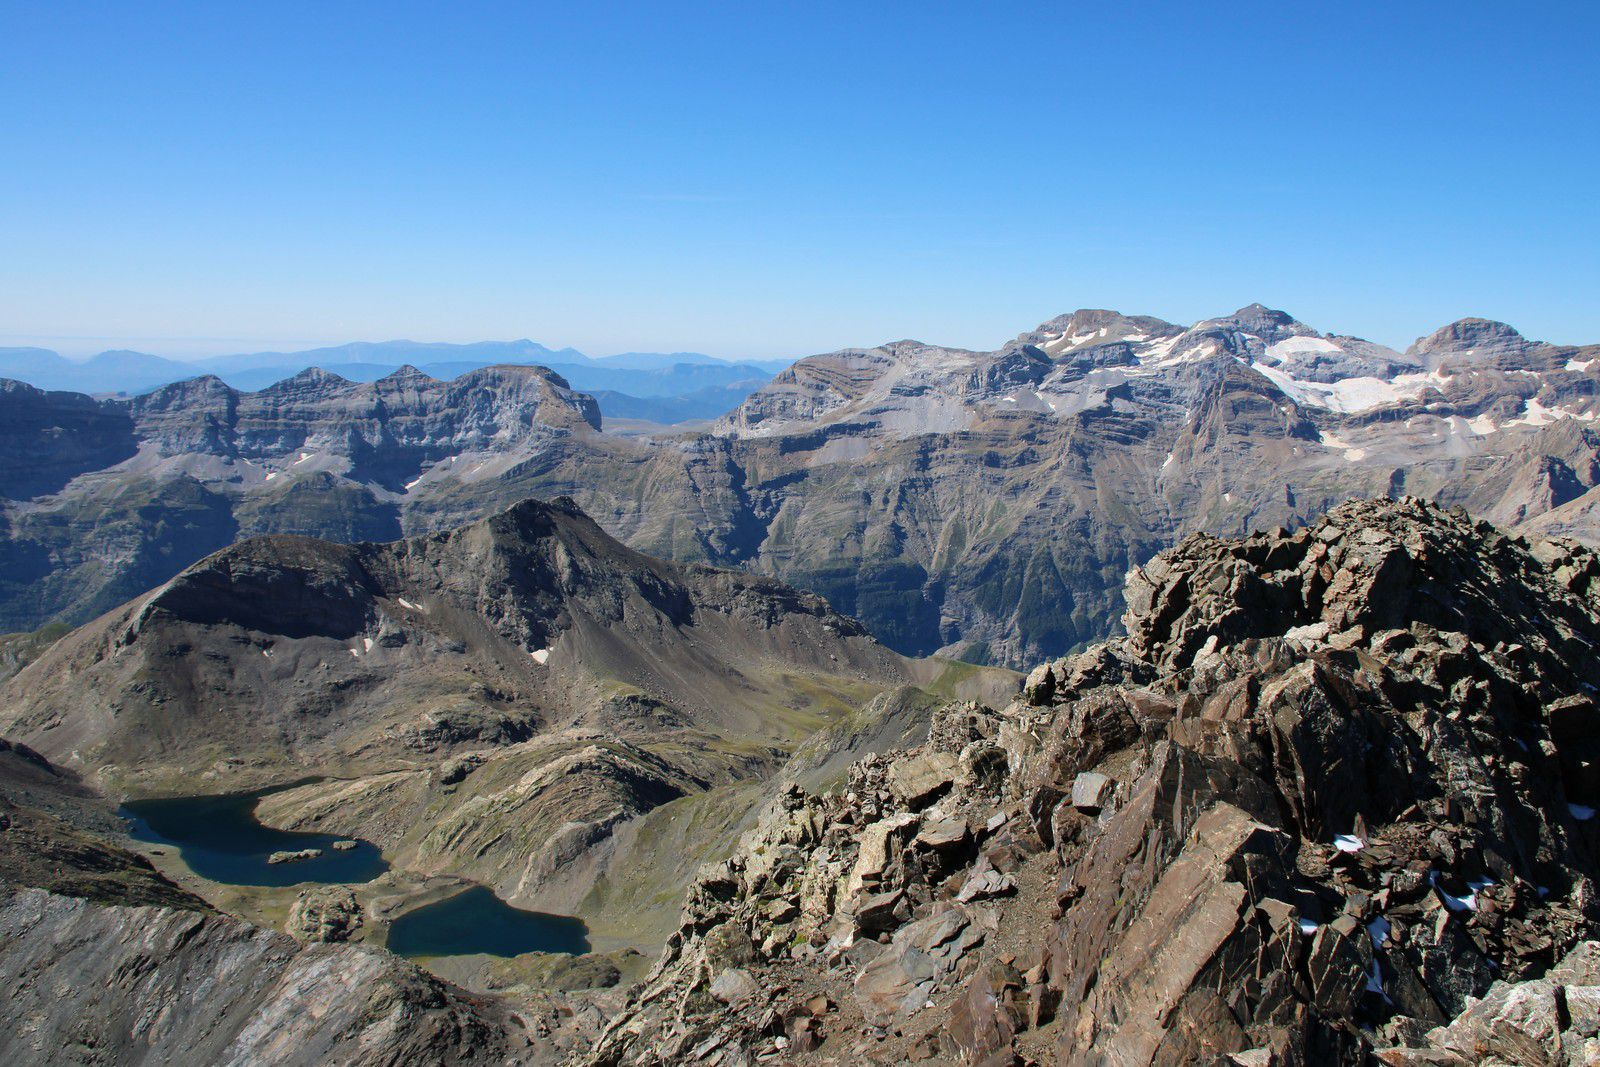 Les lacs de la Munia et le massif du Mont Perdu depuis la Munia.